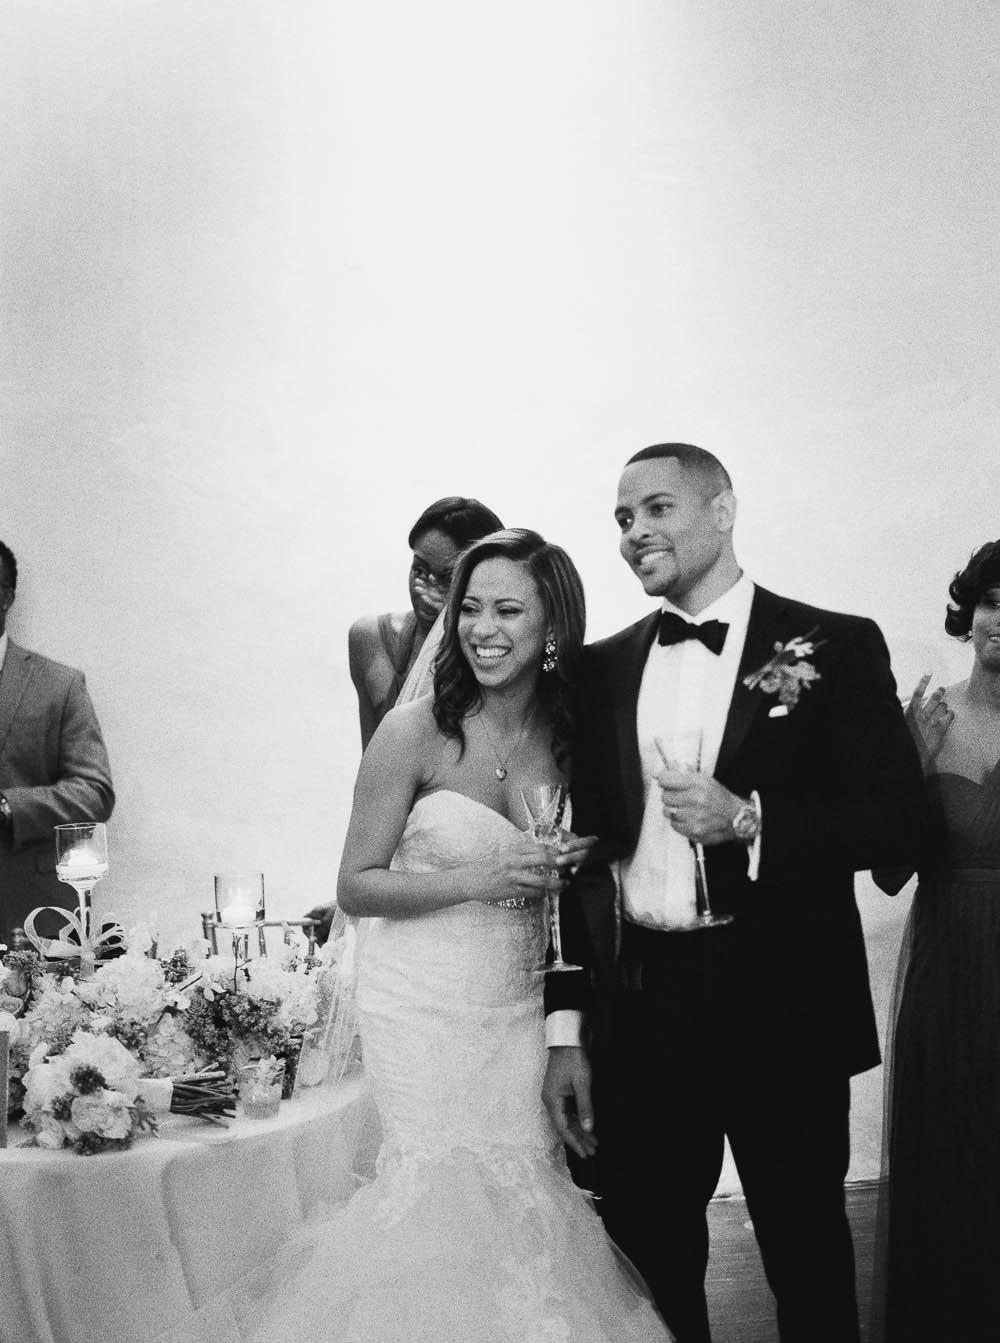 nashville ruby film documentary wedding photographer heartfelt real moments african american wedding munalachi bride ©2016abigailbobophotography-52.jpg